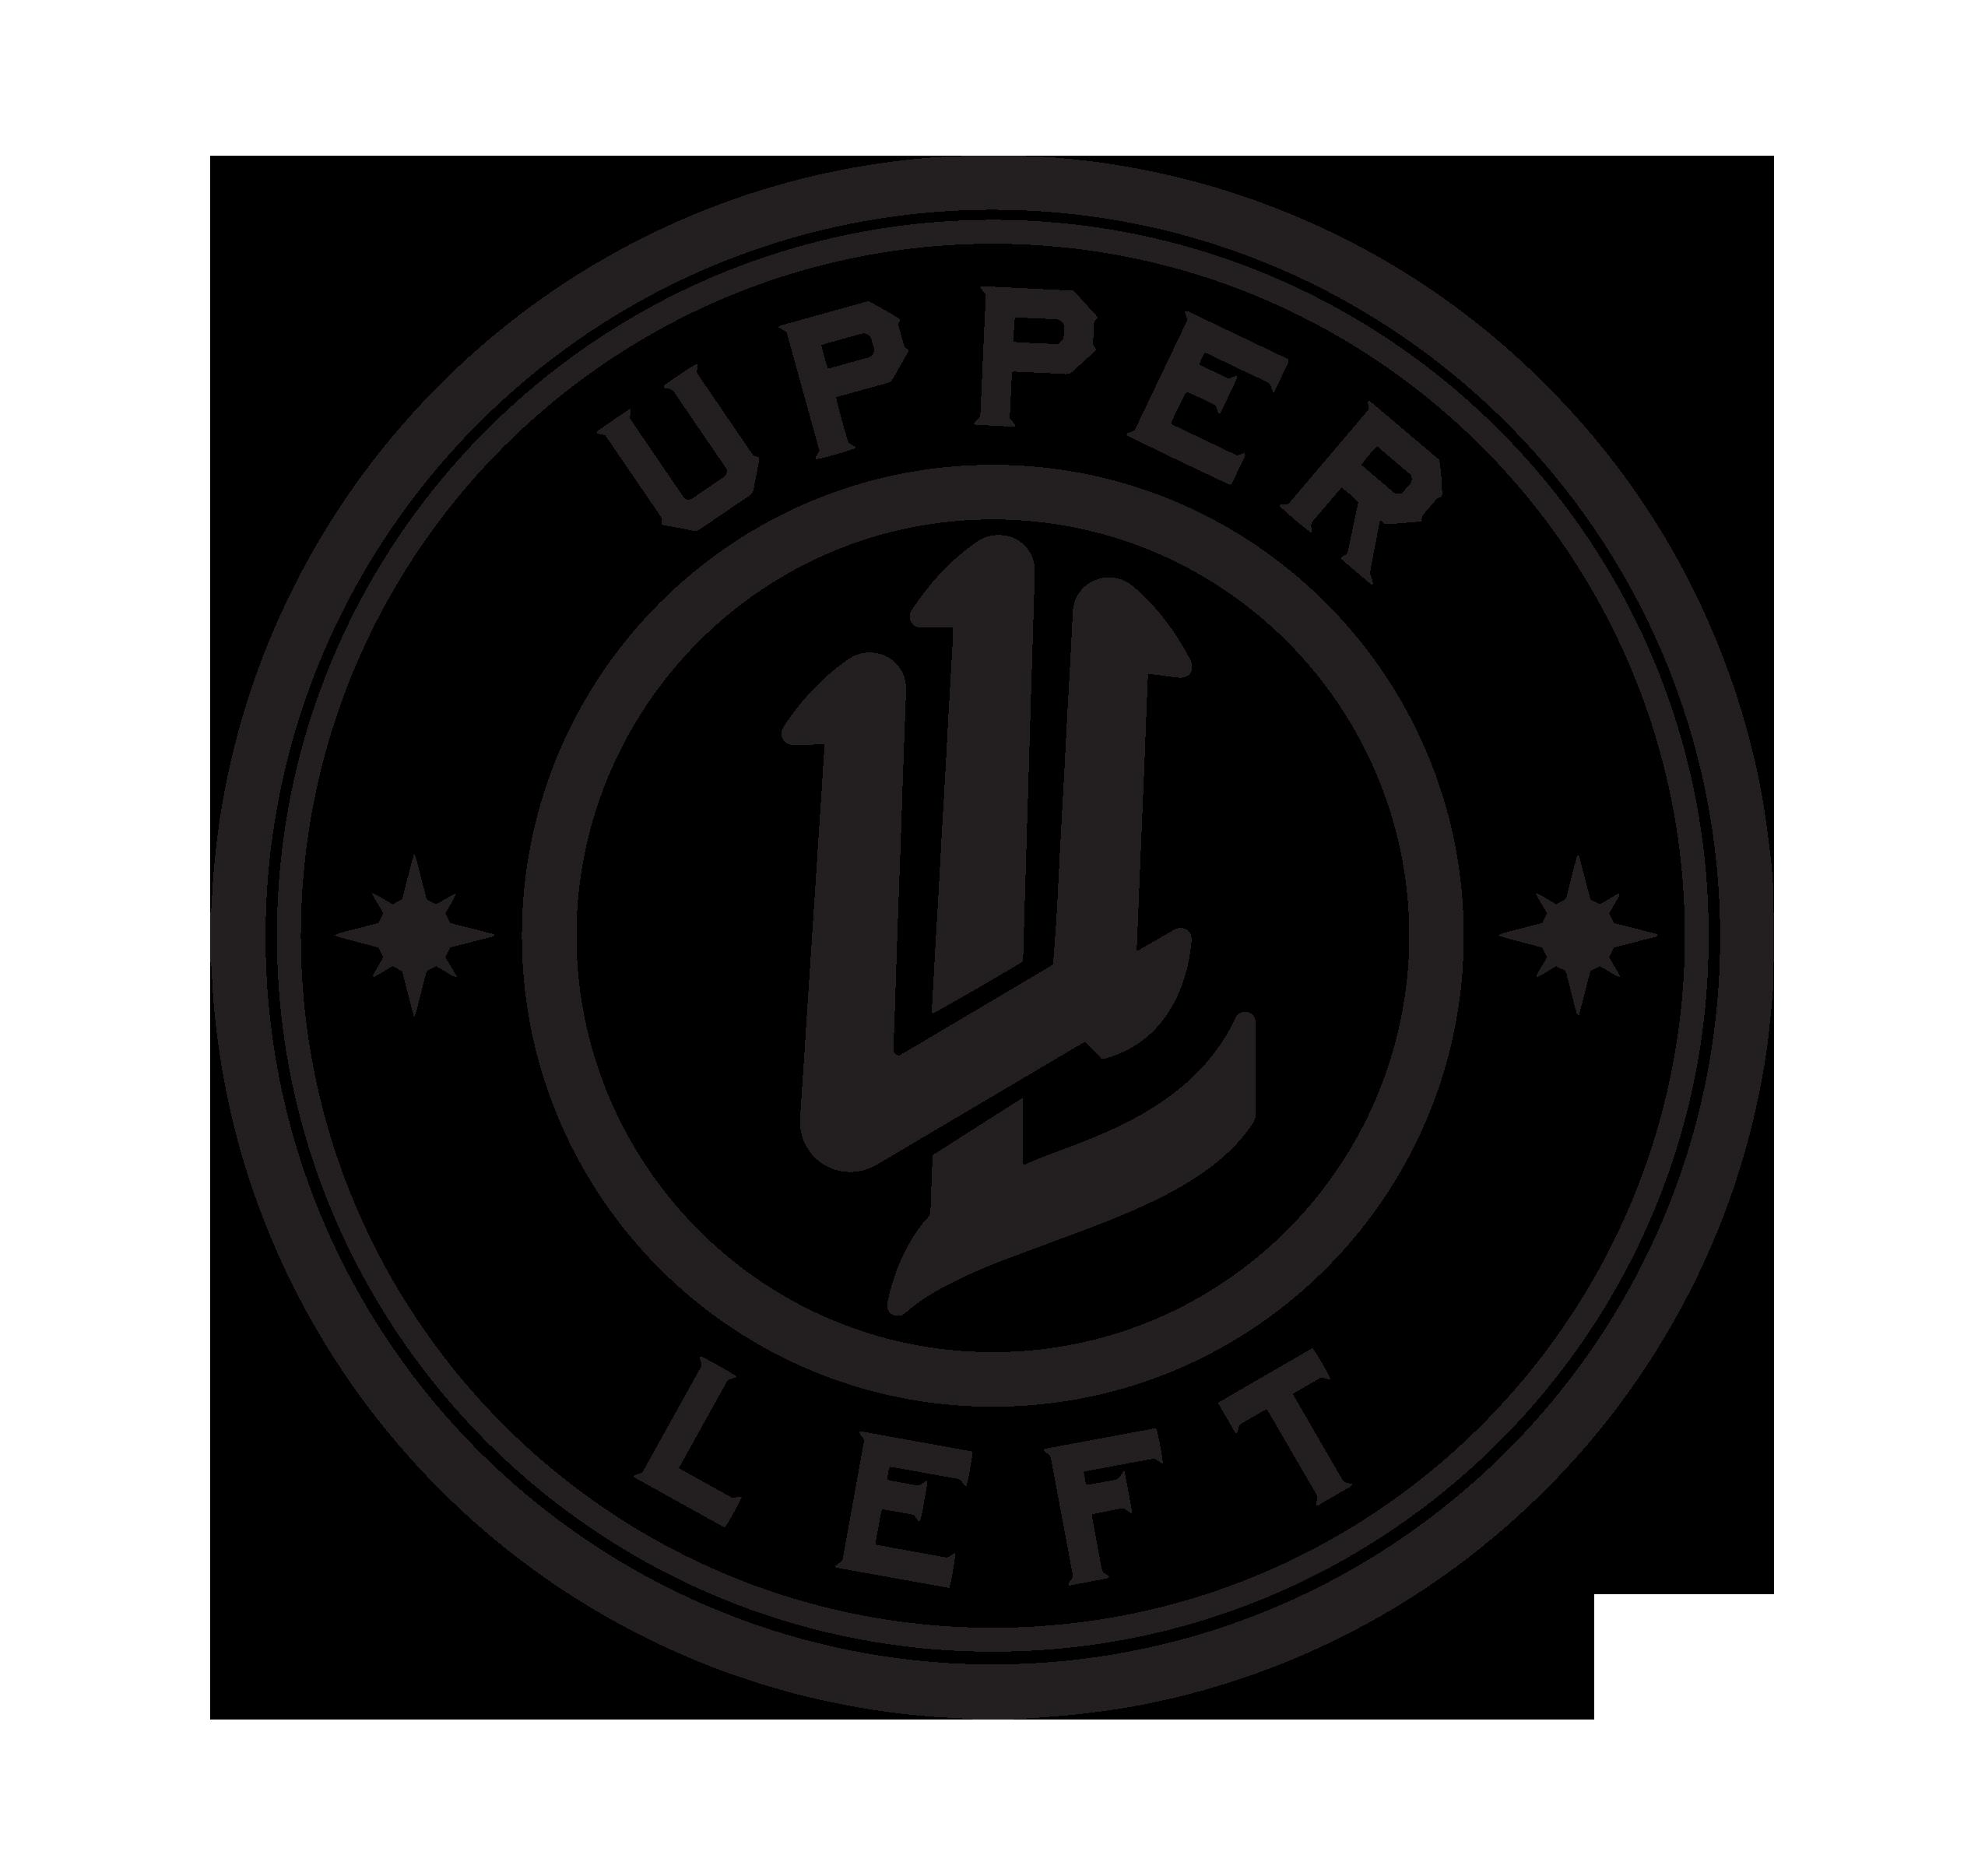 UL_logo_stamp_black